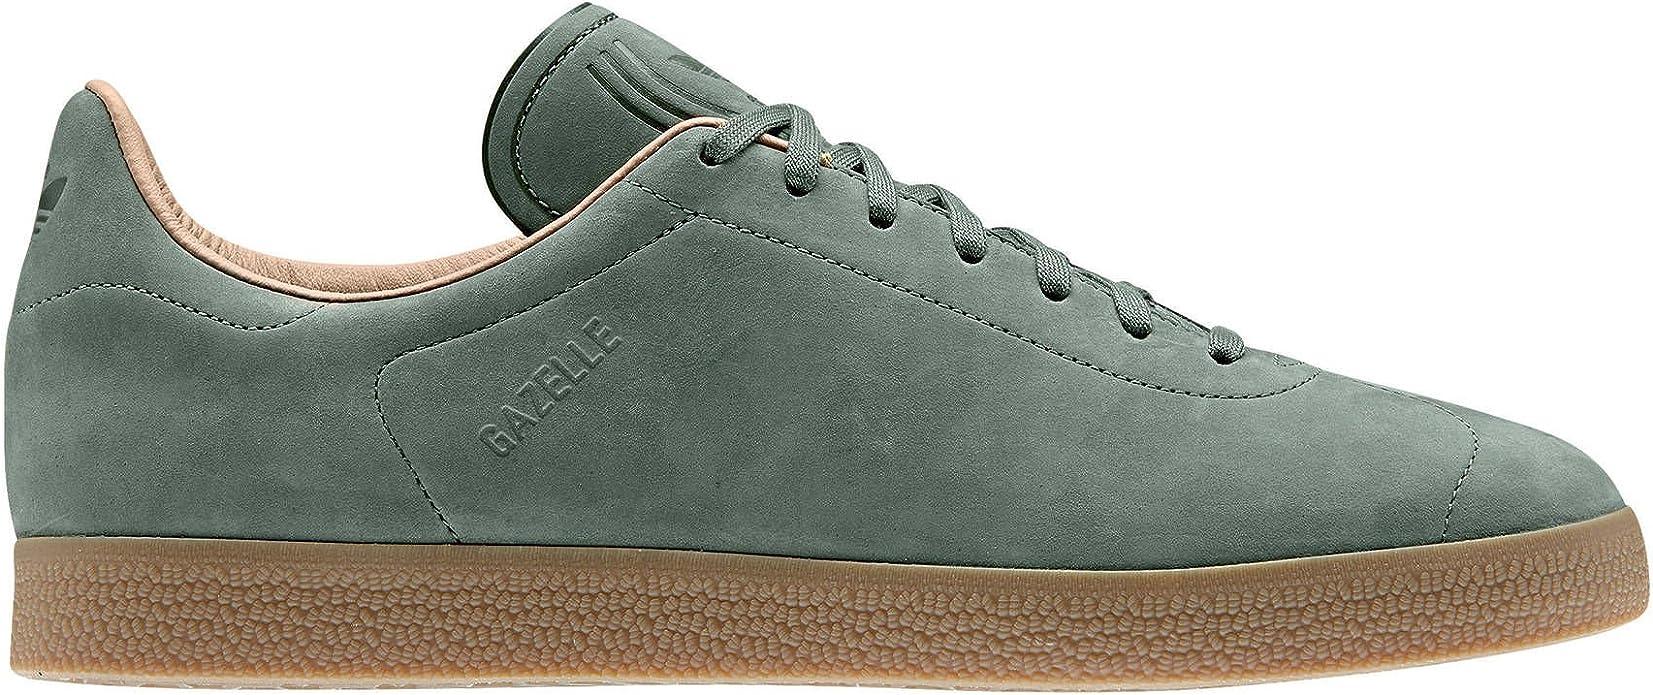 Gazelle Decon CG3705 Fitness Shoes